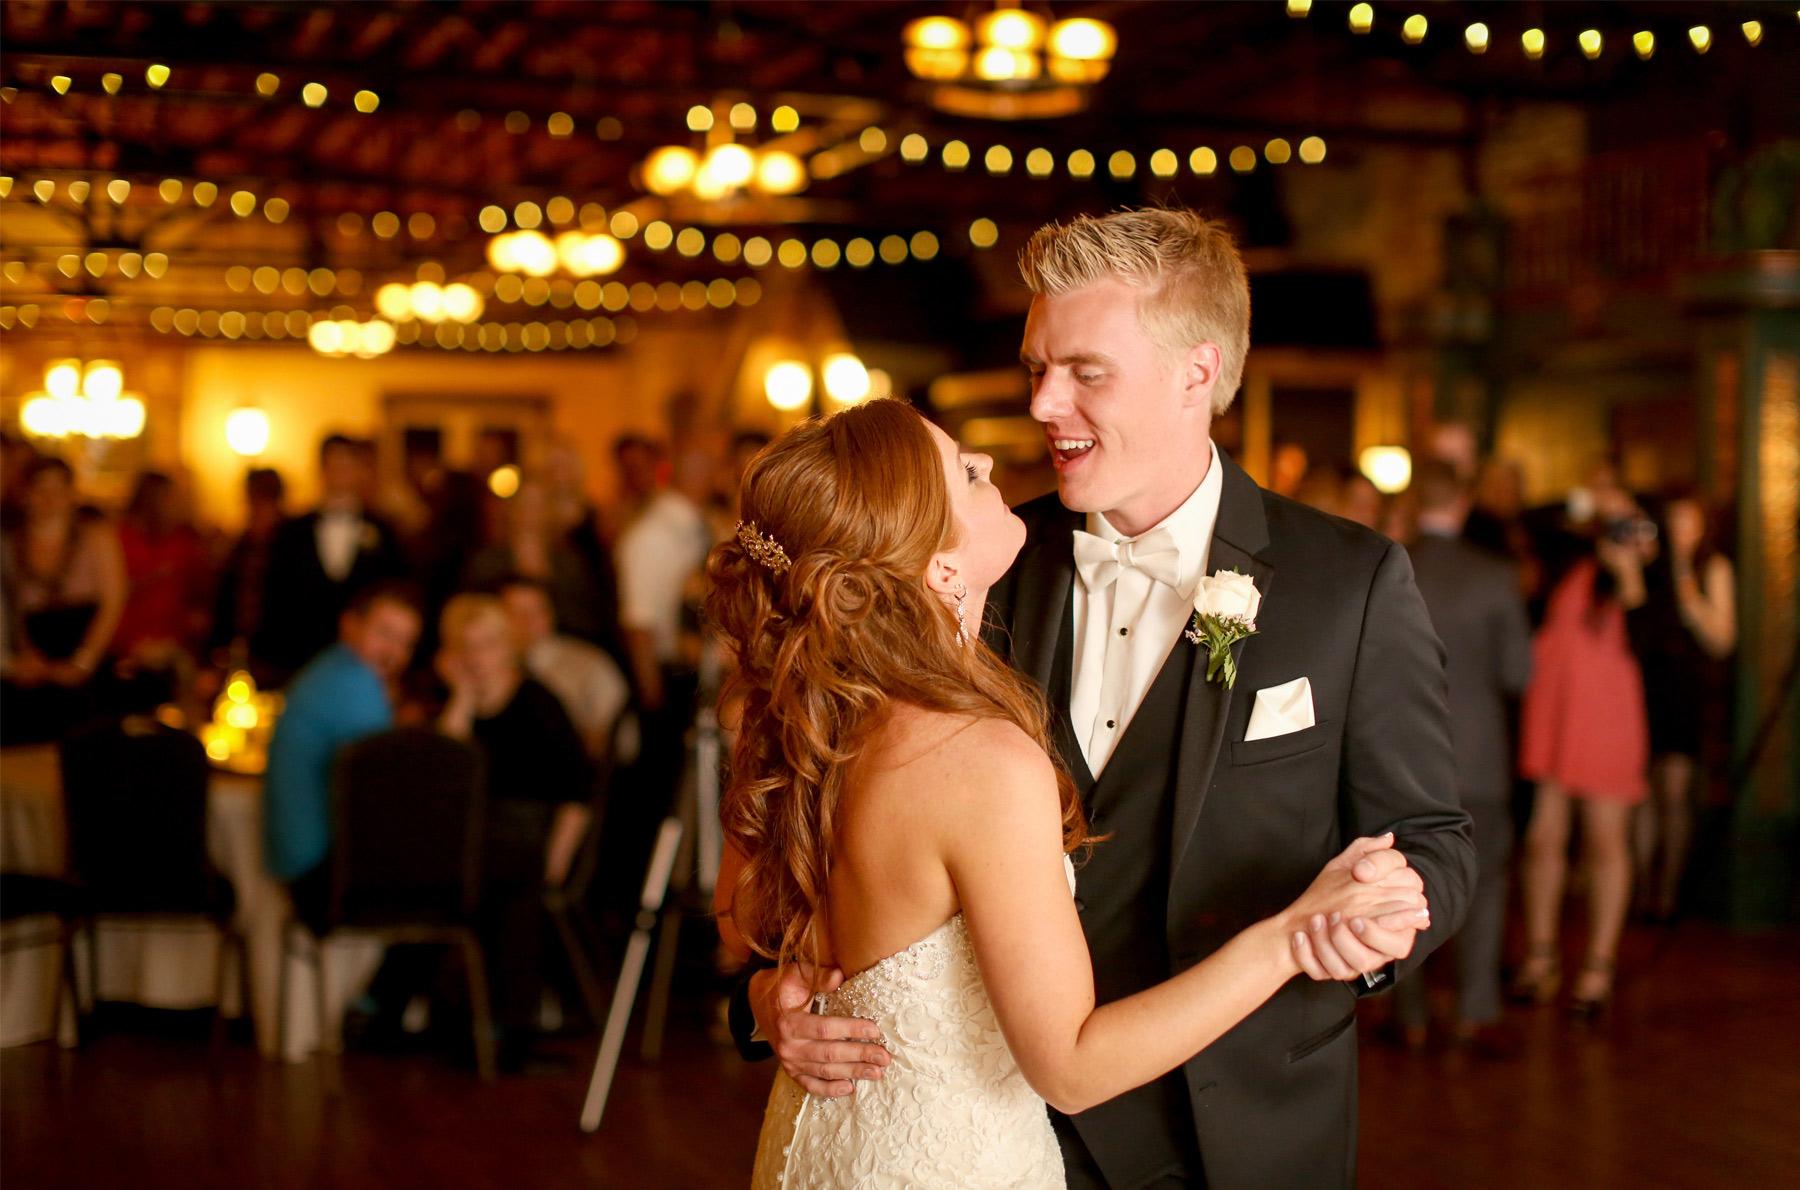 15-Minneapolis-Minnesota-Wedding-Photography-by-Vick-Photography-Reception-Kellermans-Event-Center-First-Dance-Tianna-&-Matt.jpg